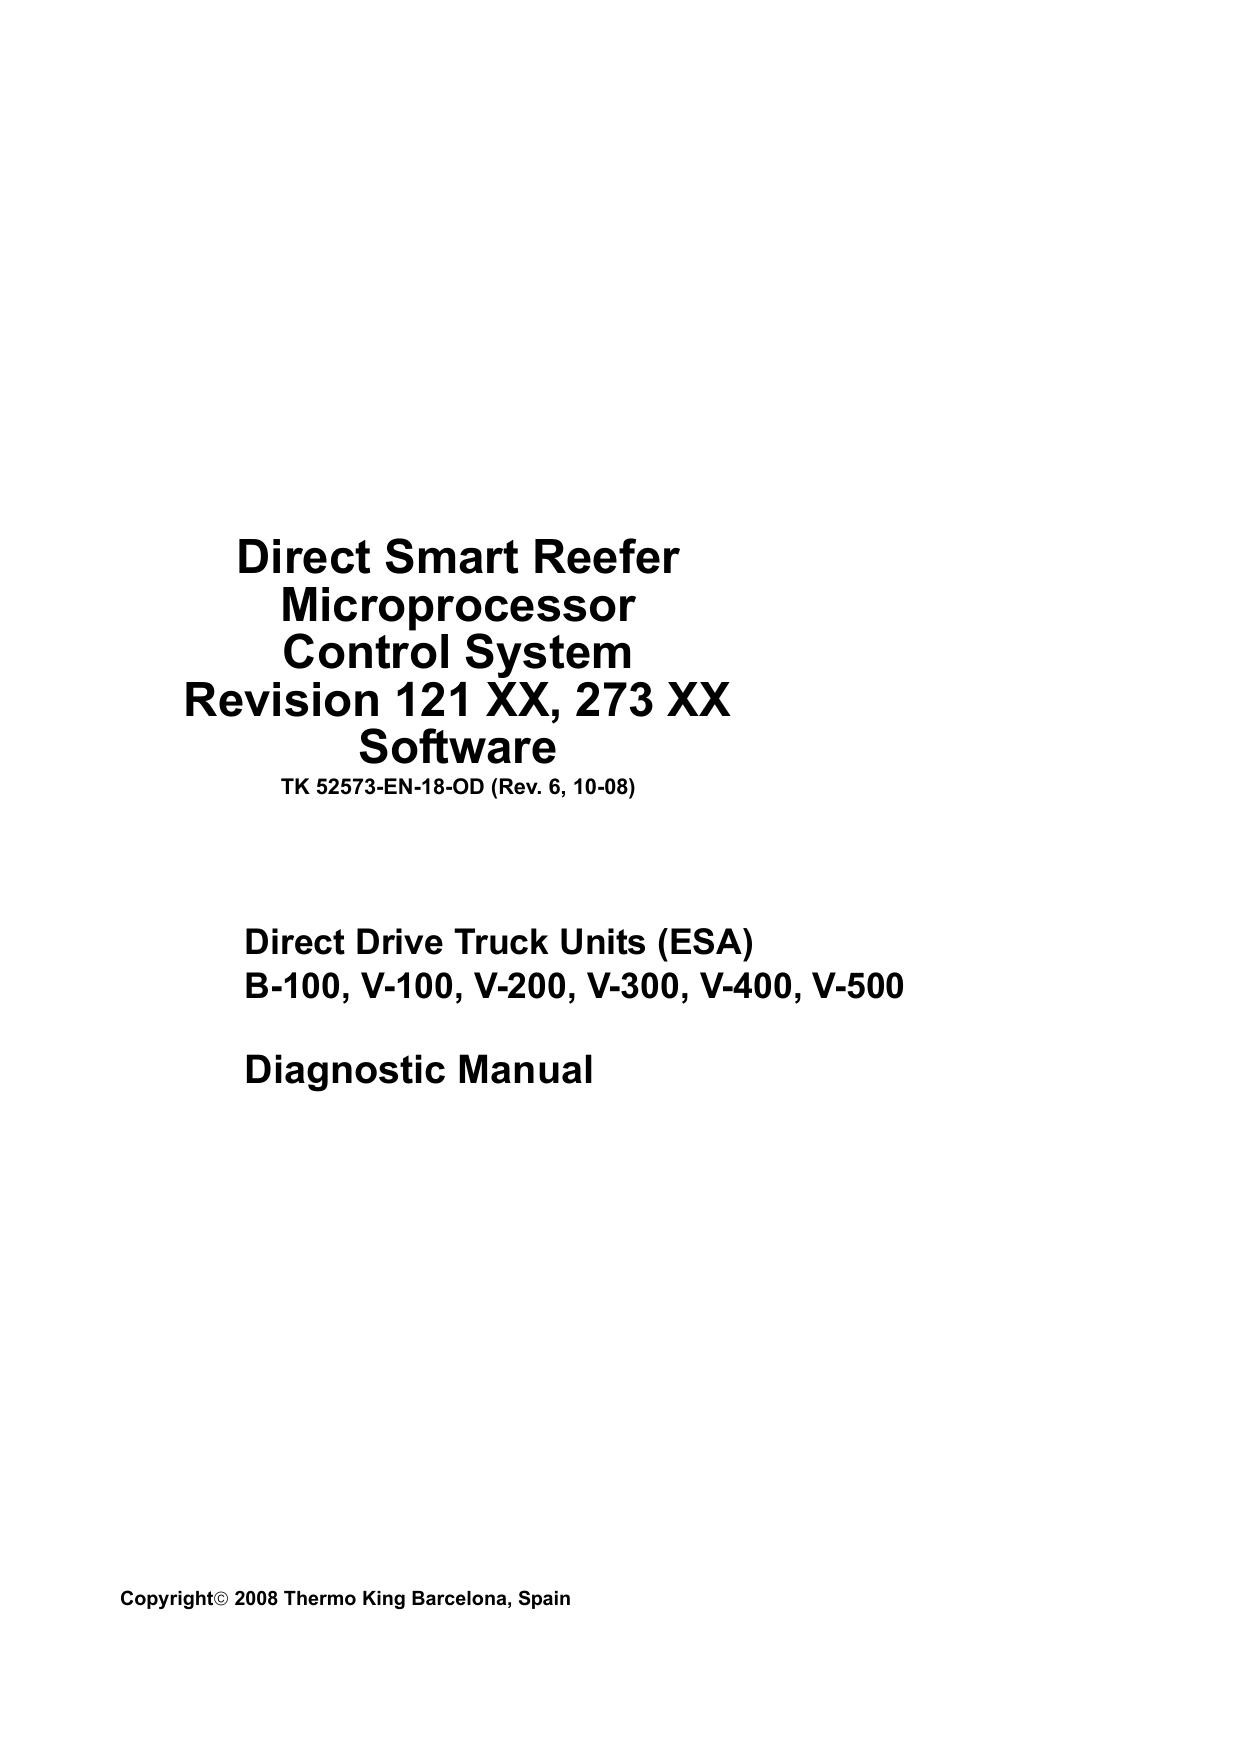 Direct Smart Reefer Microprocessor Control System | manualzz com